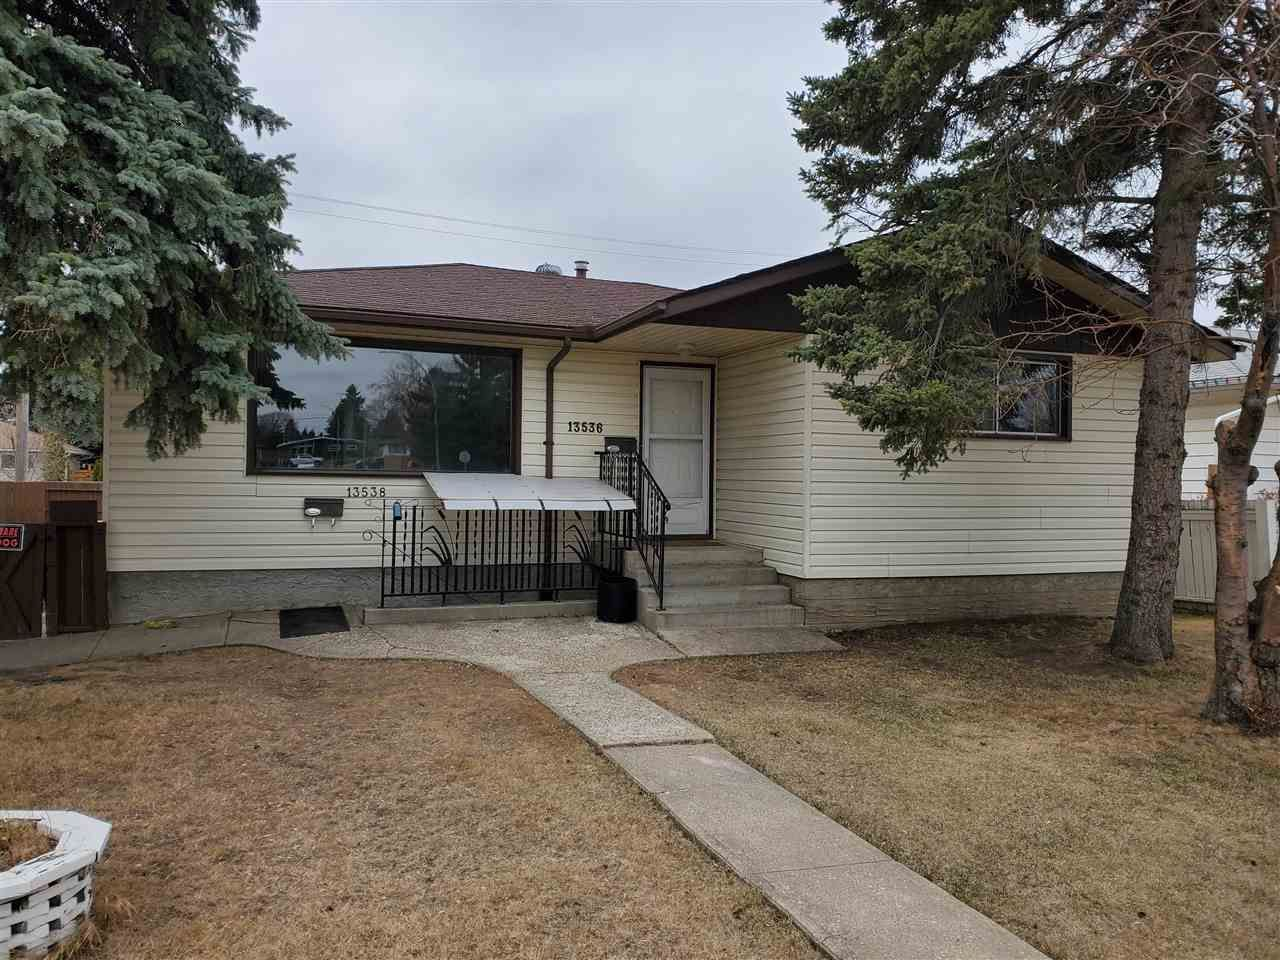 Main Photo: 13536 119 Street in Edmonton: Zone 01 House for sale : MLS®# E4240934